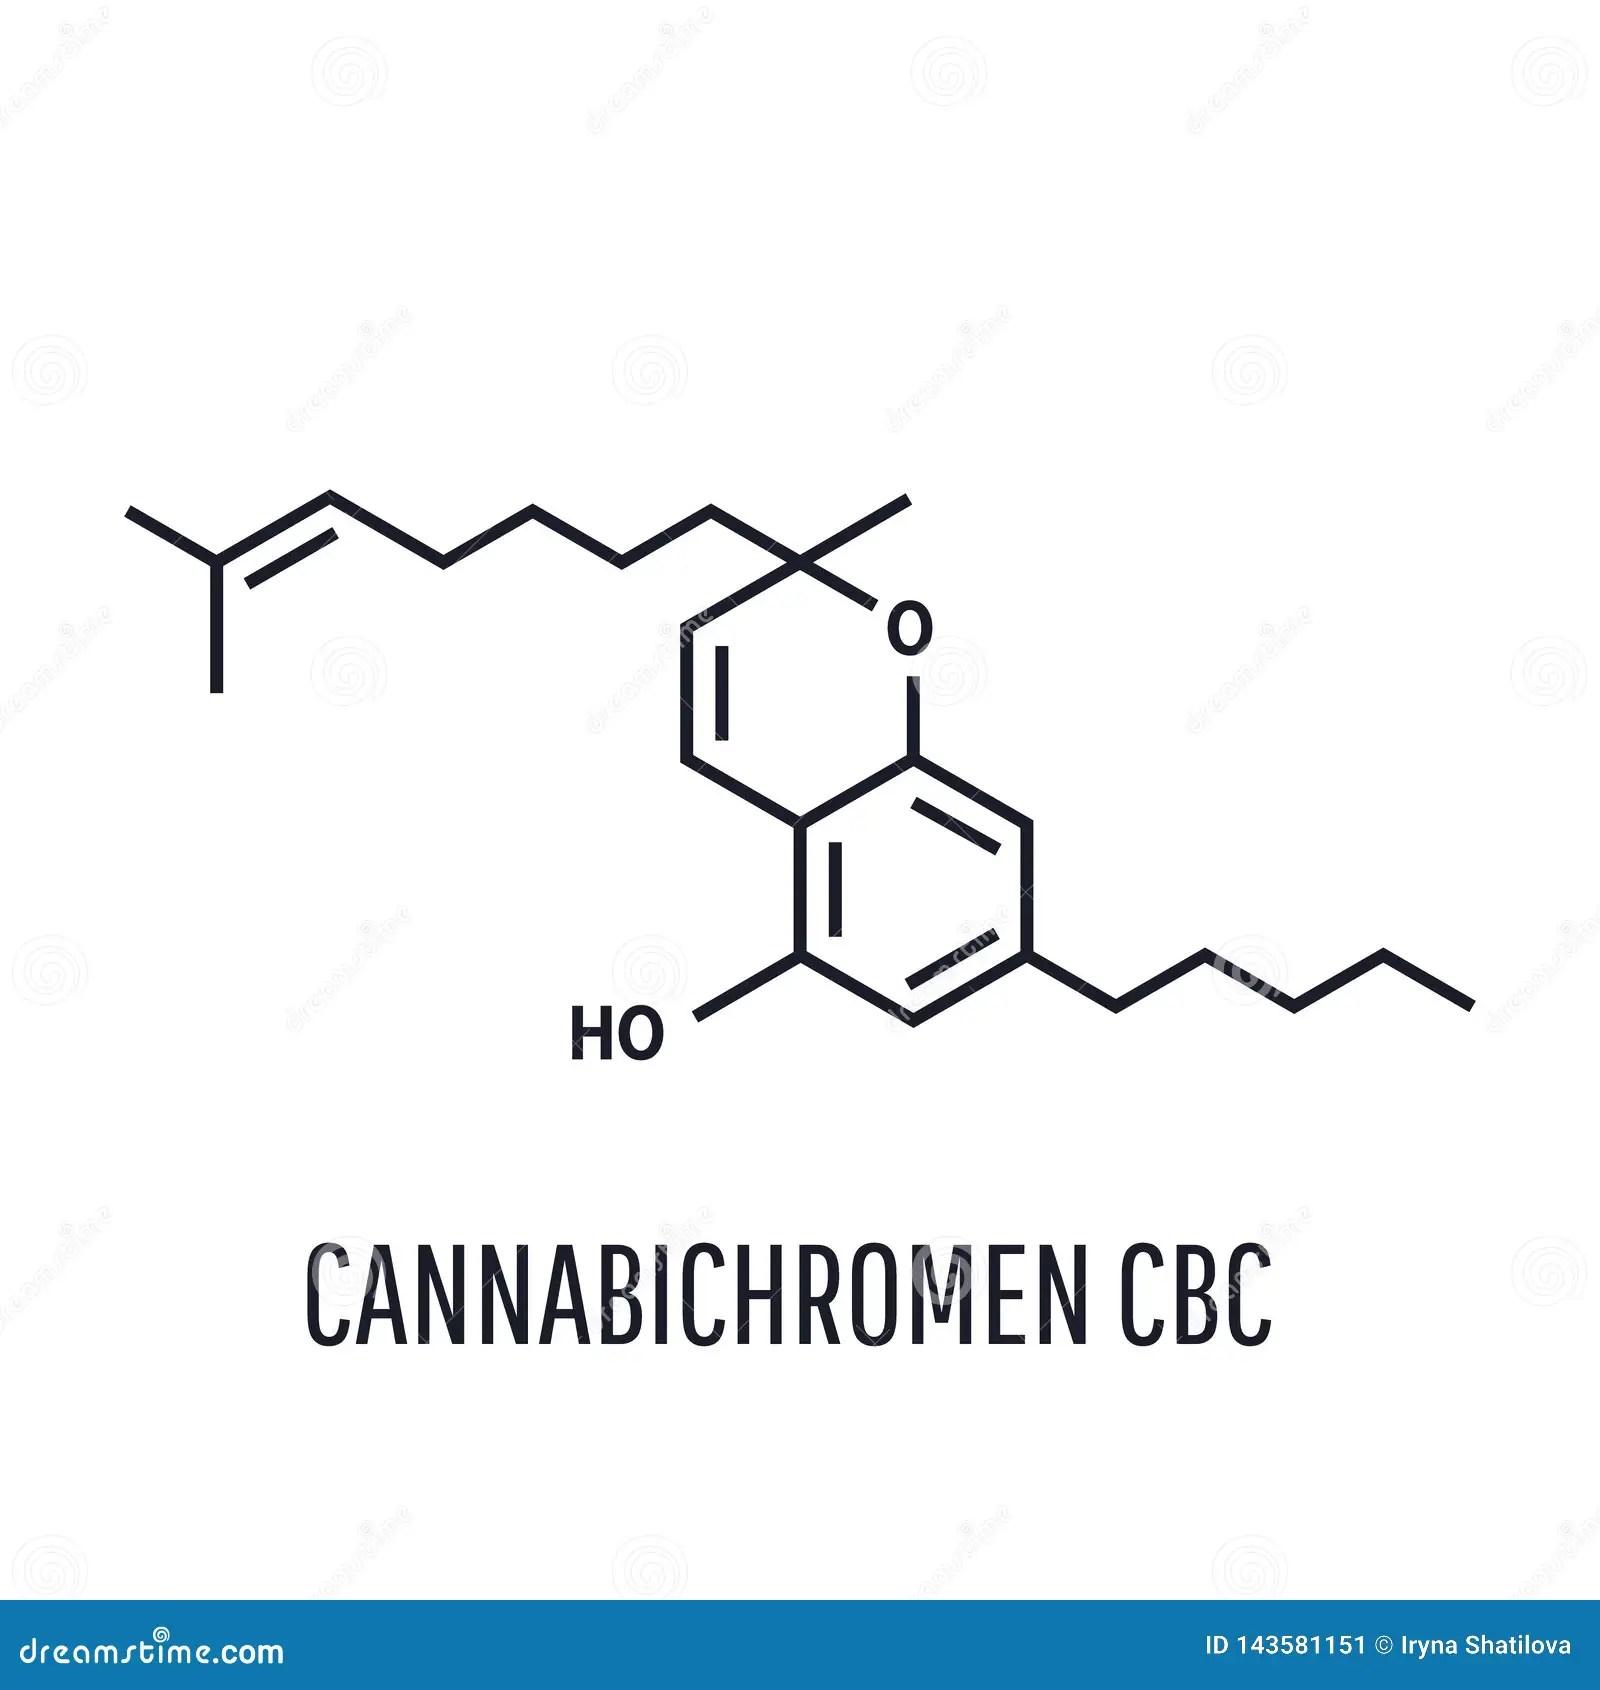 hight resolution of cannabichromen cbc vector illustration within the cannabis plant cbc occurs mainly as cannabichromenic acid